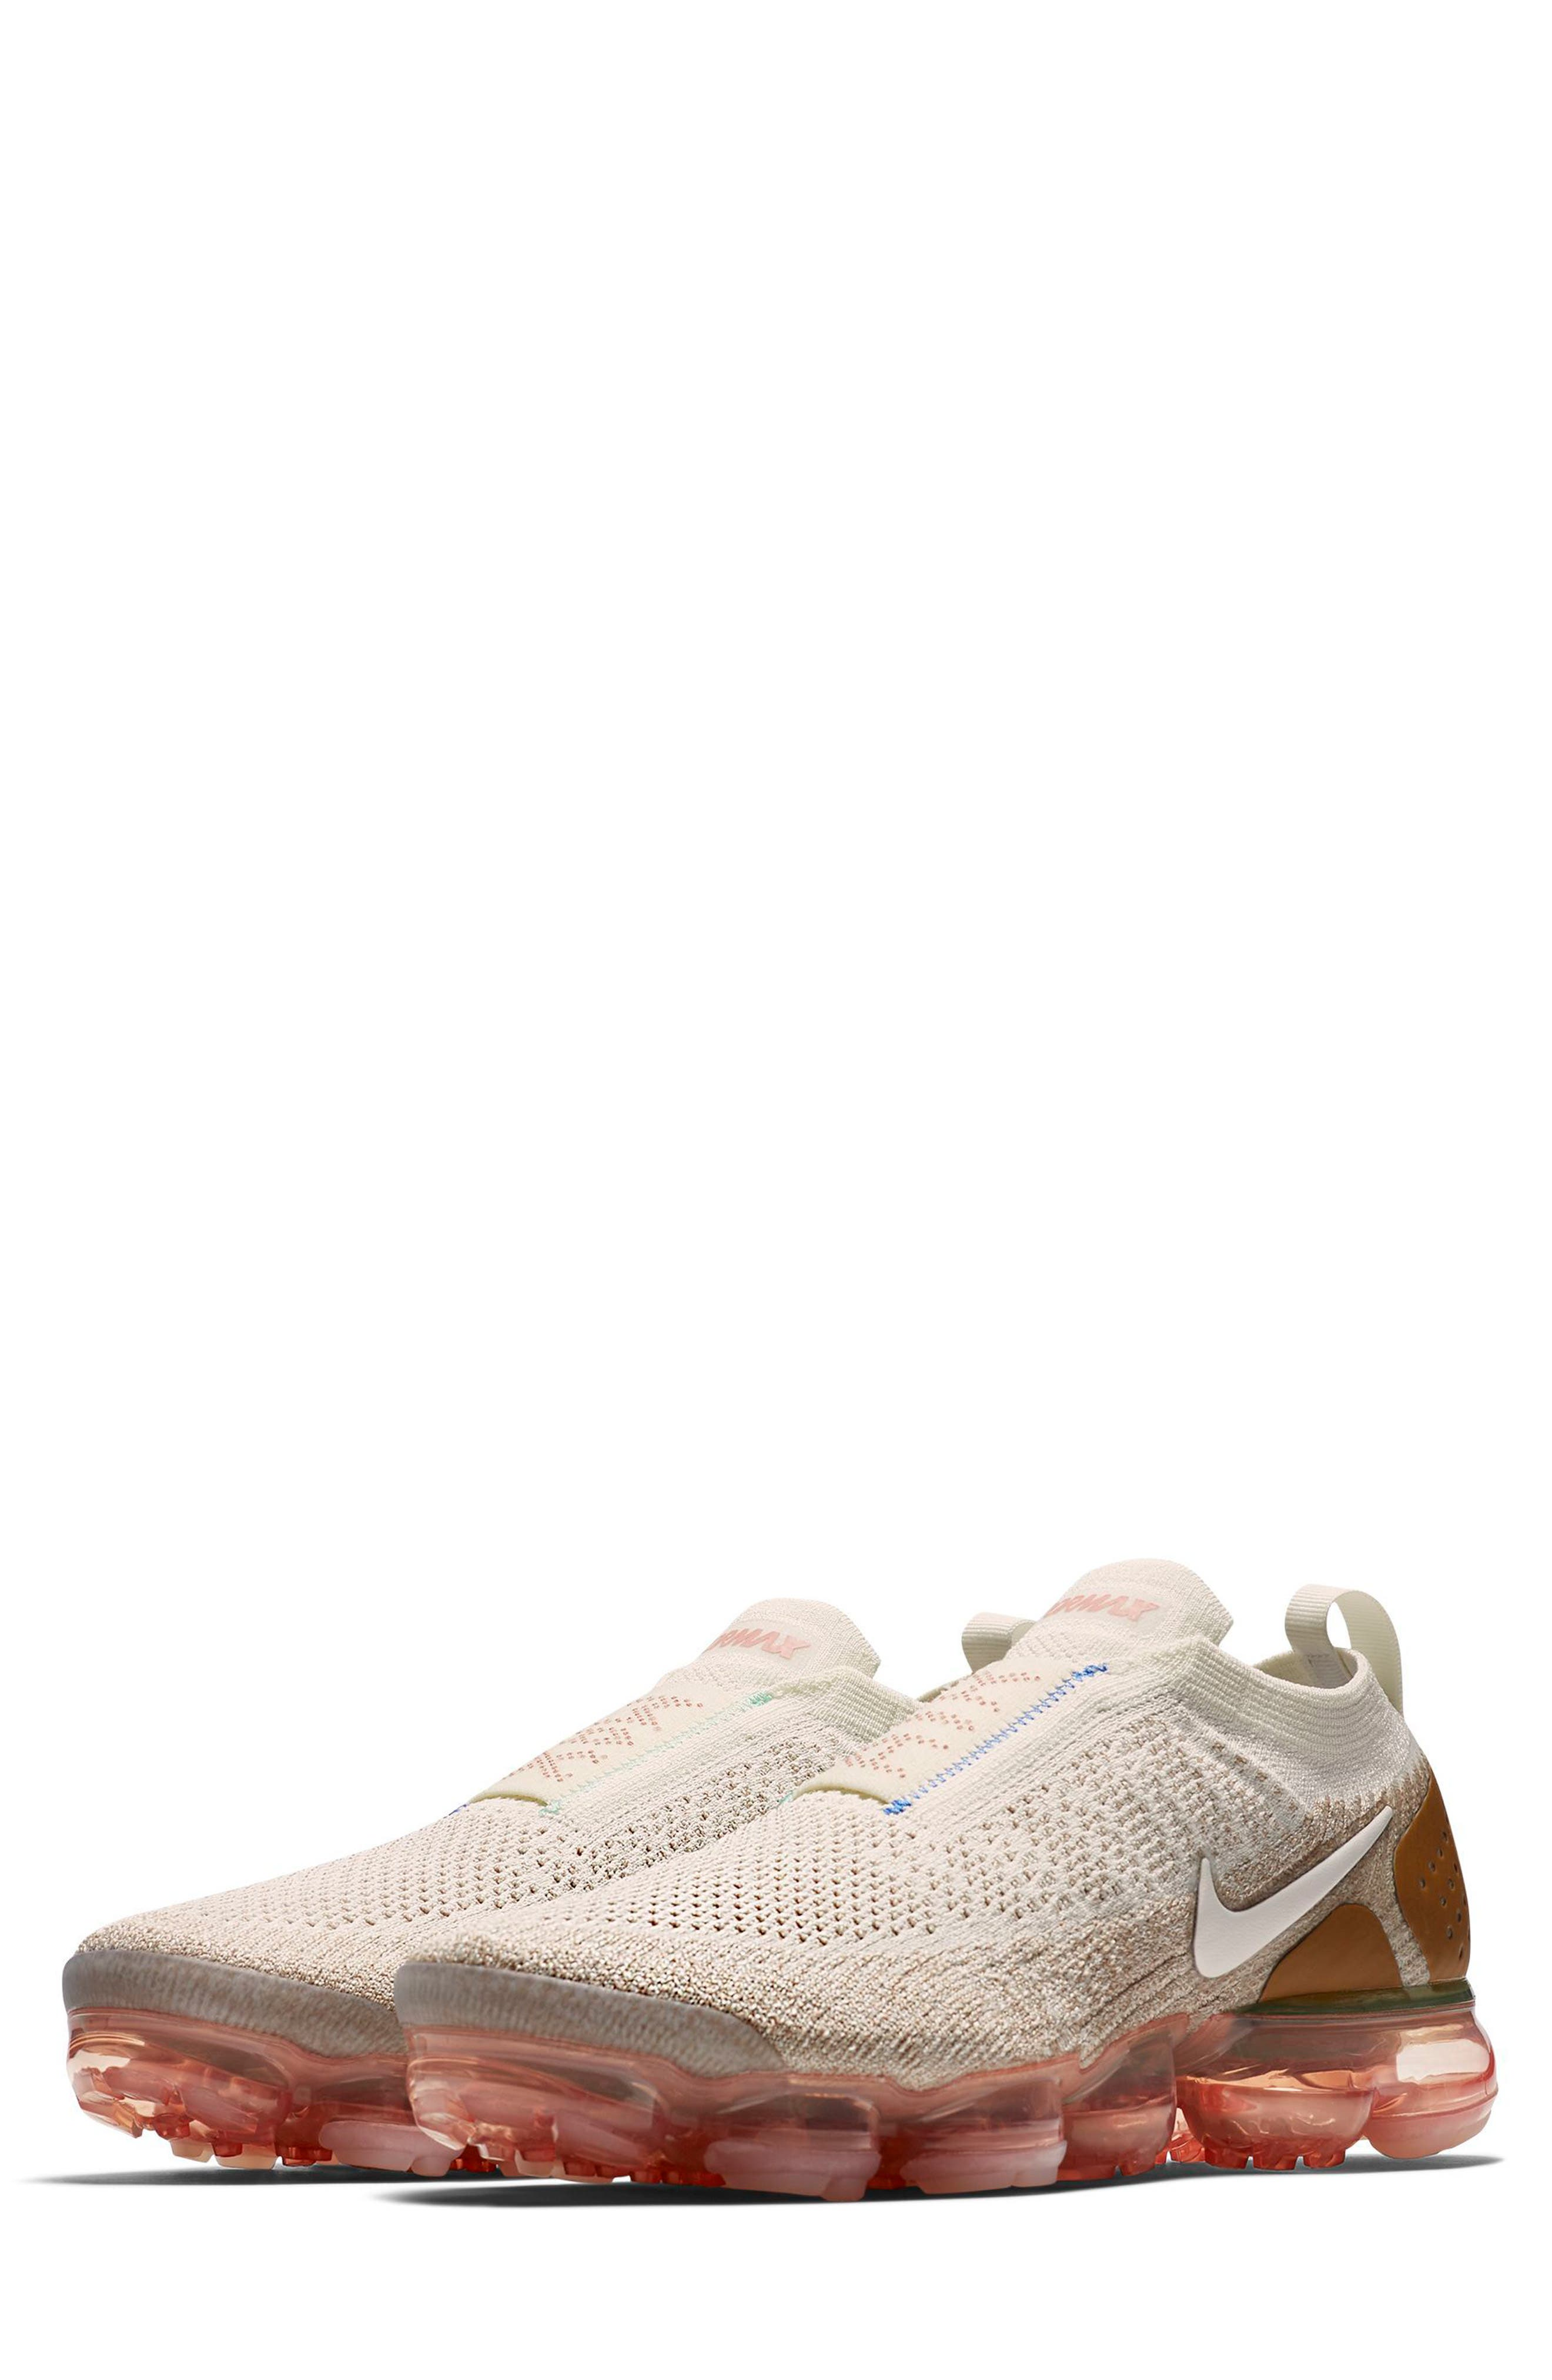 Nike Air VaporMax Flyknit MOC 2 Running Shoe (Unisex)